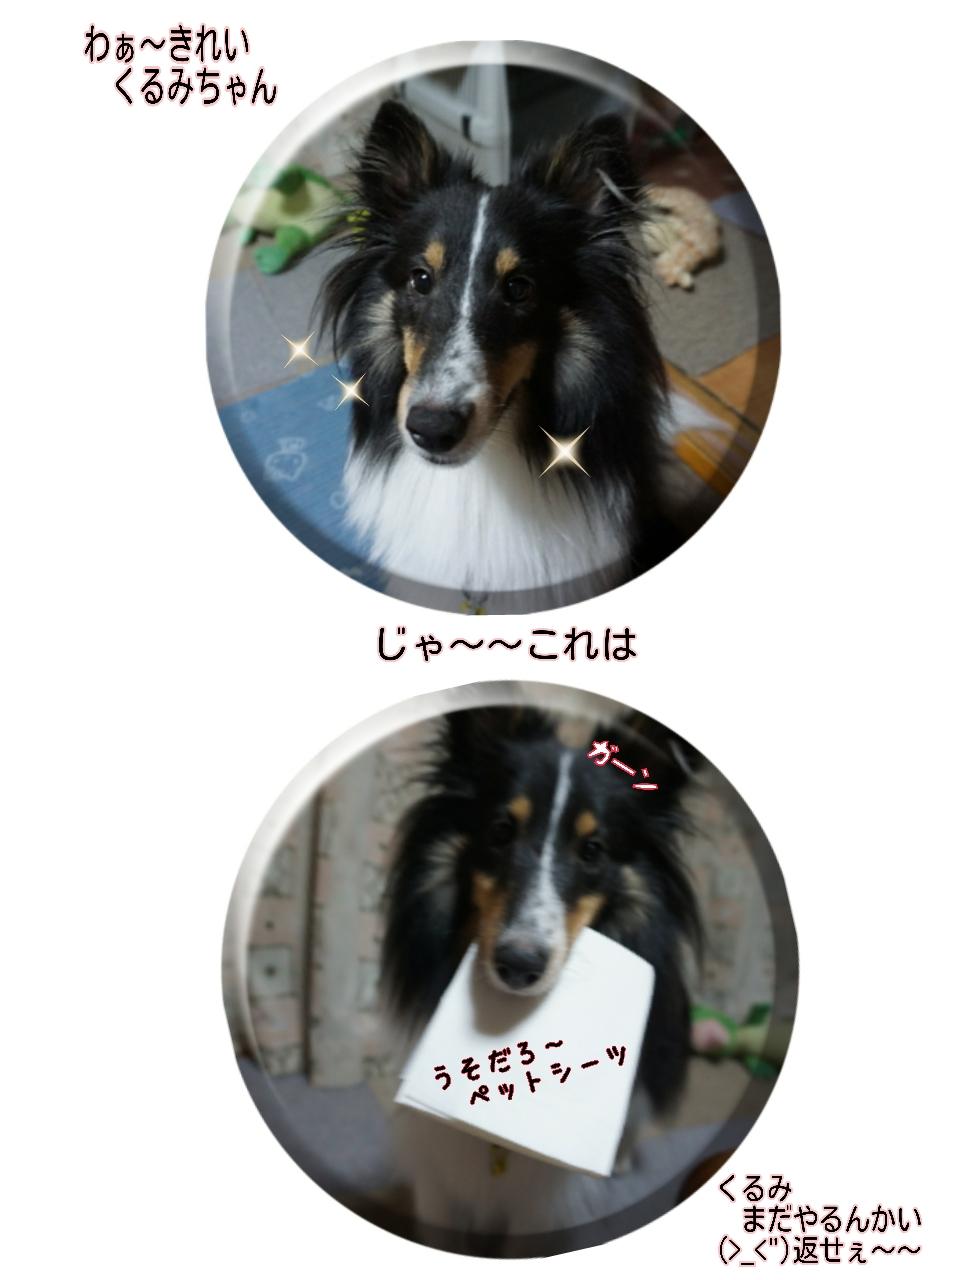 16-09-02-12-01-25-715_deco.jpg